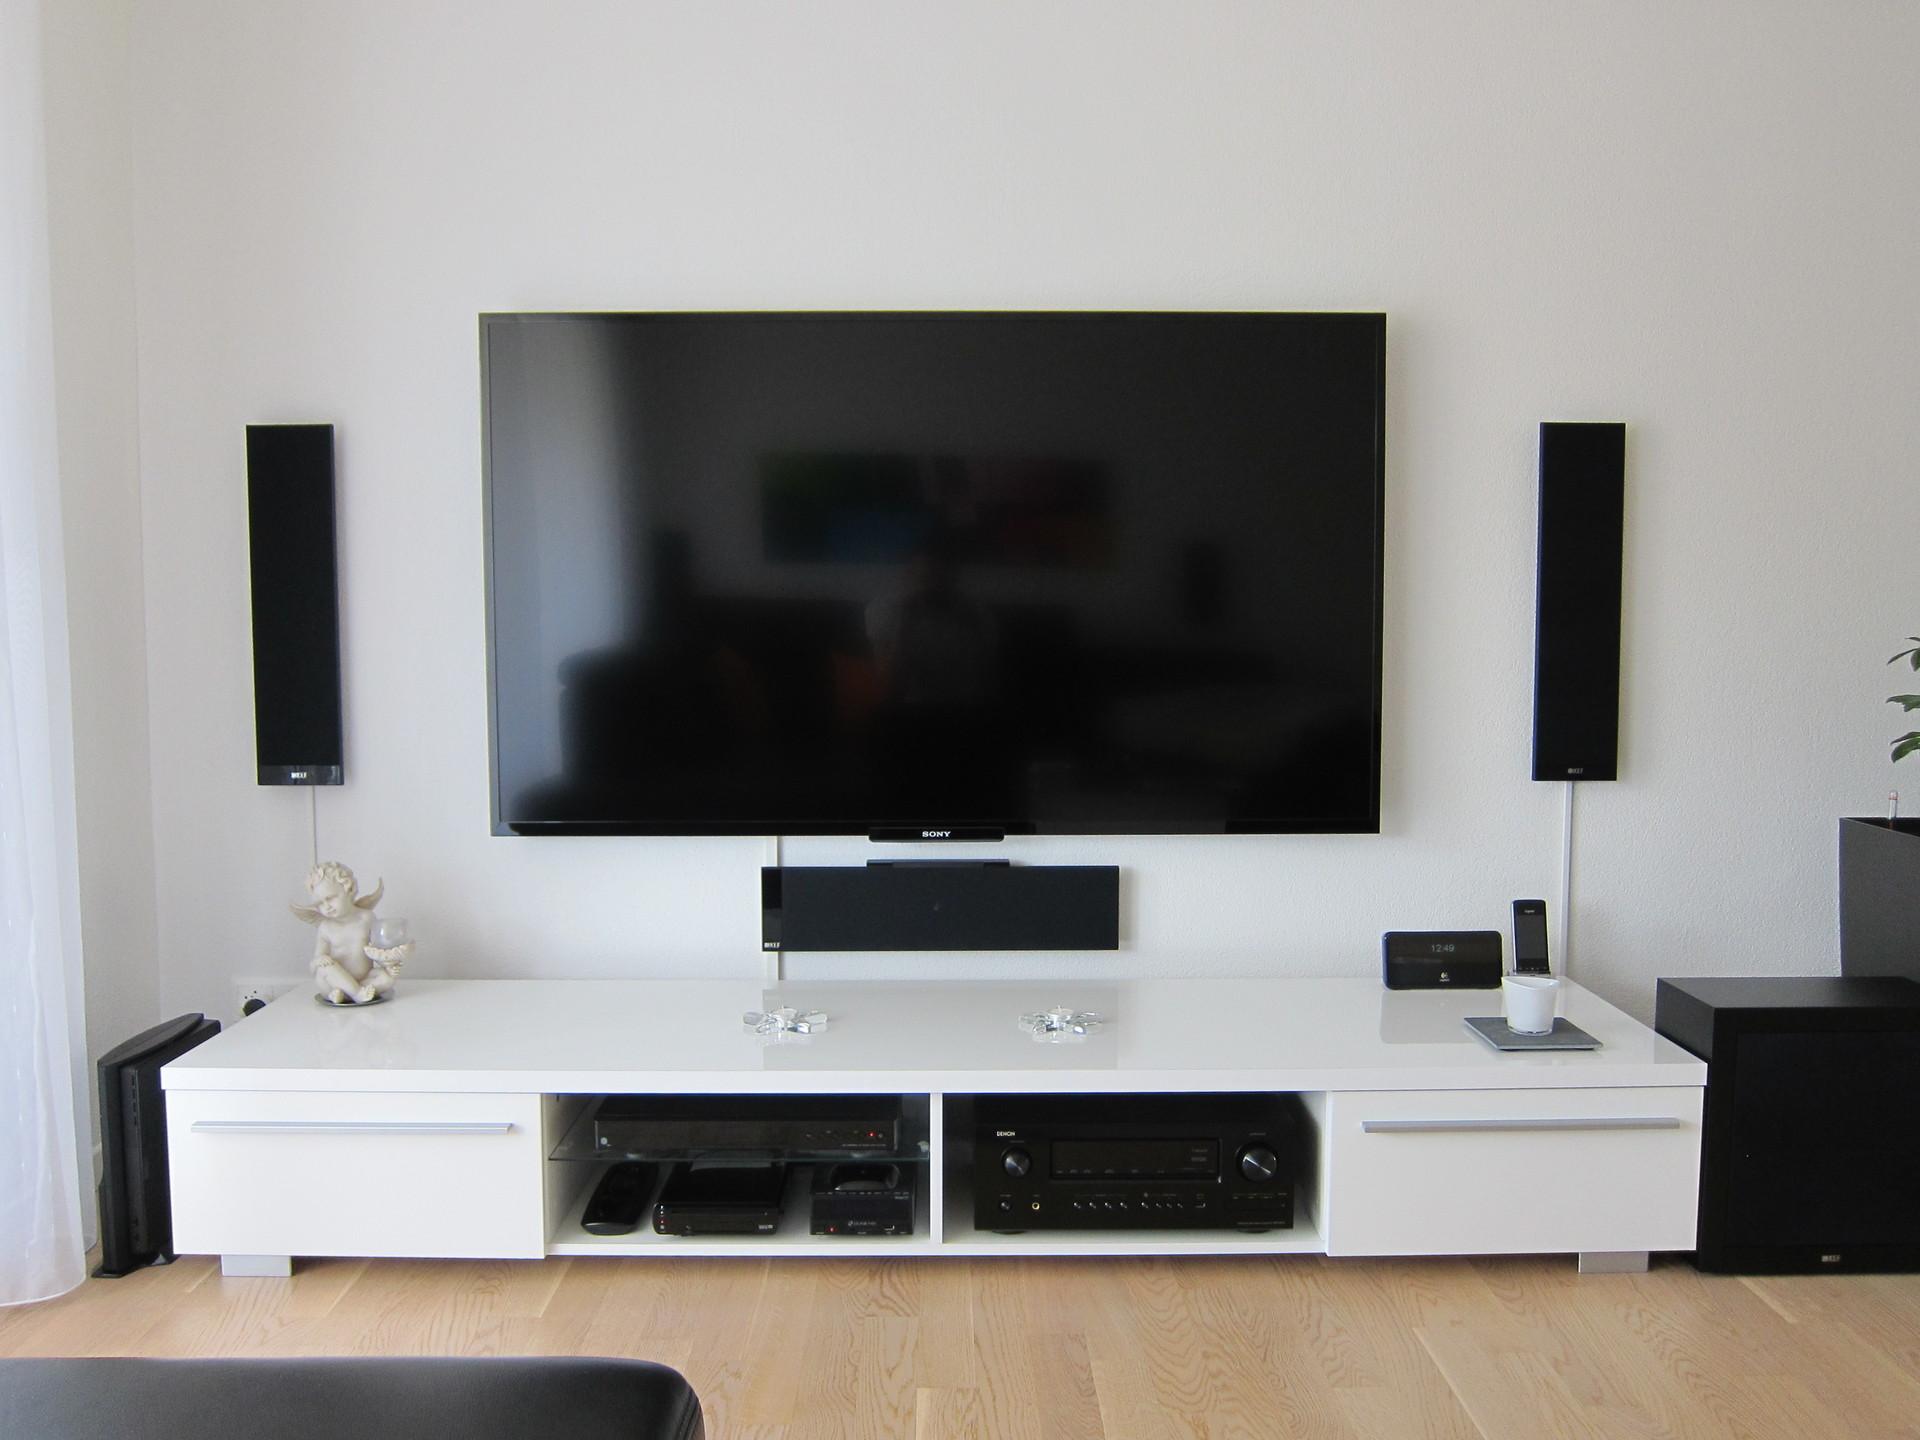 sony 65w855a home cinema 65w855a cinema home sony. Black Bedroom Furniture Sets. Home Design Ideas